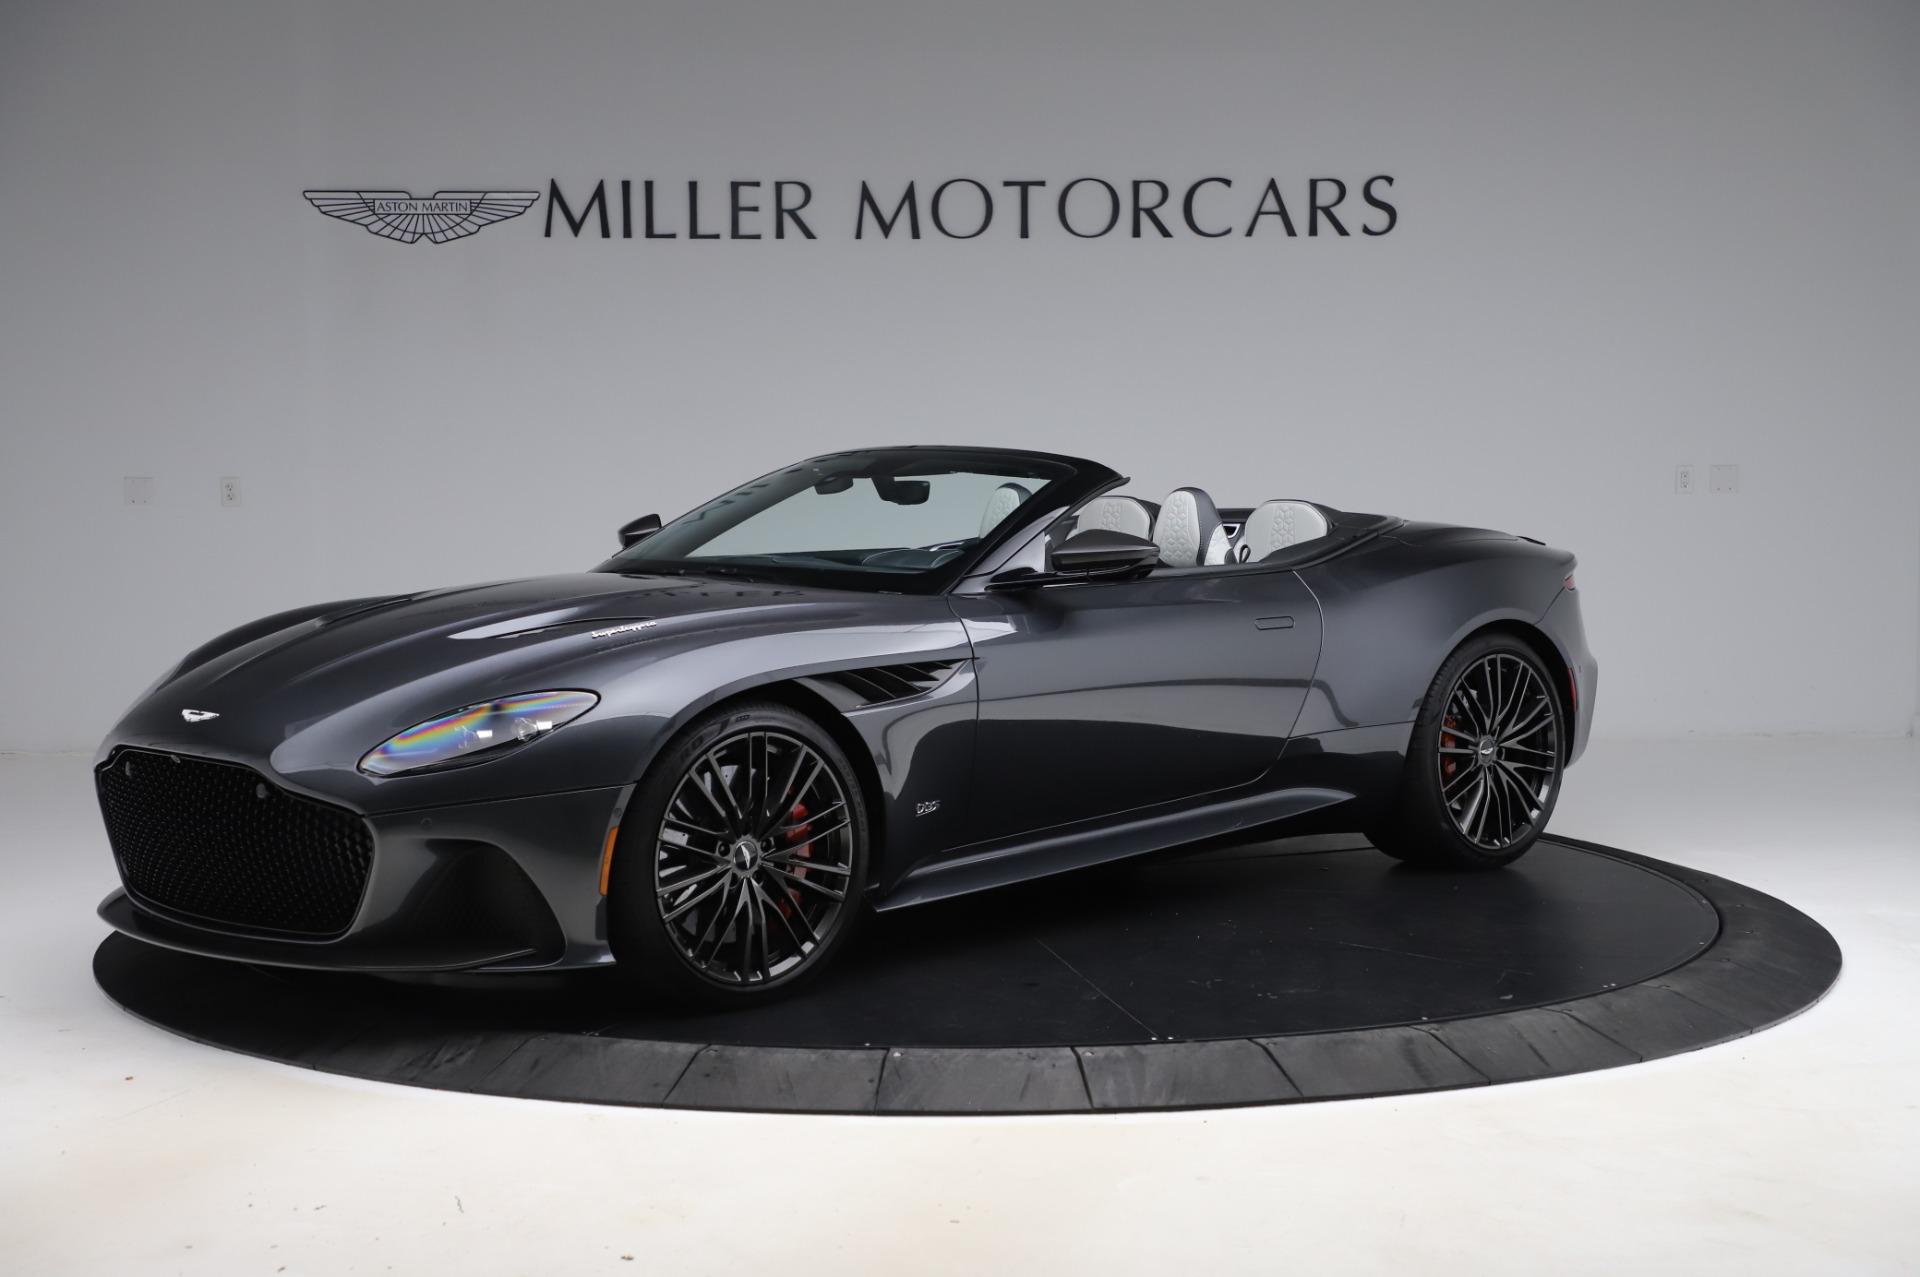 Used 2020 Aston Martin DBS Superleggera for sale $329,900 at Bentley Greenwich in Greenwich CT 06830 1